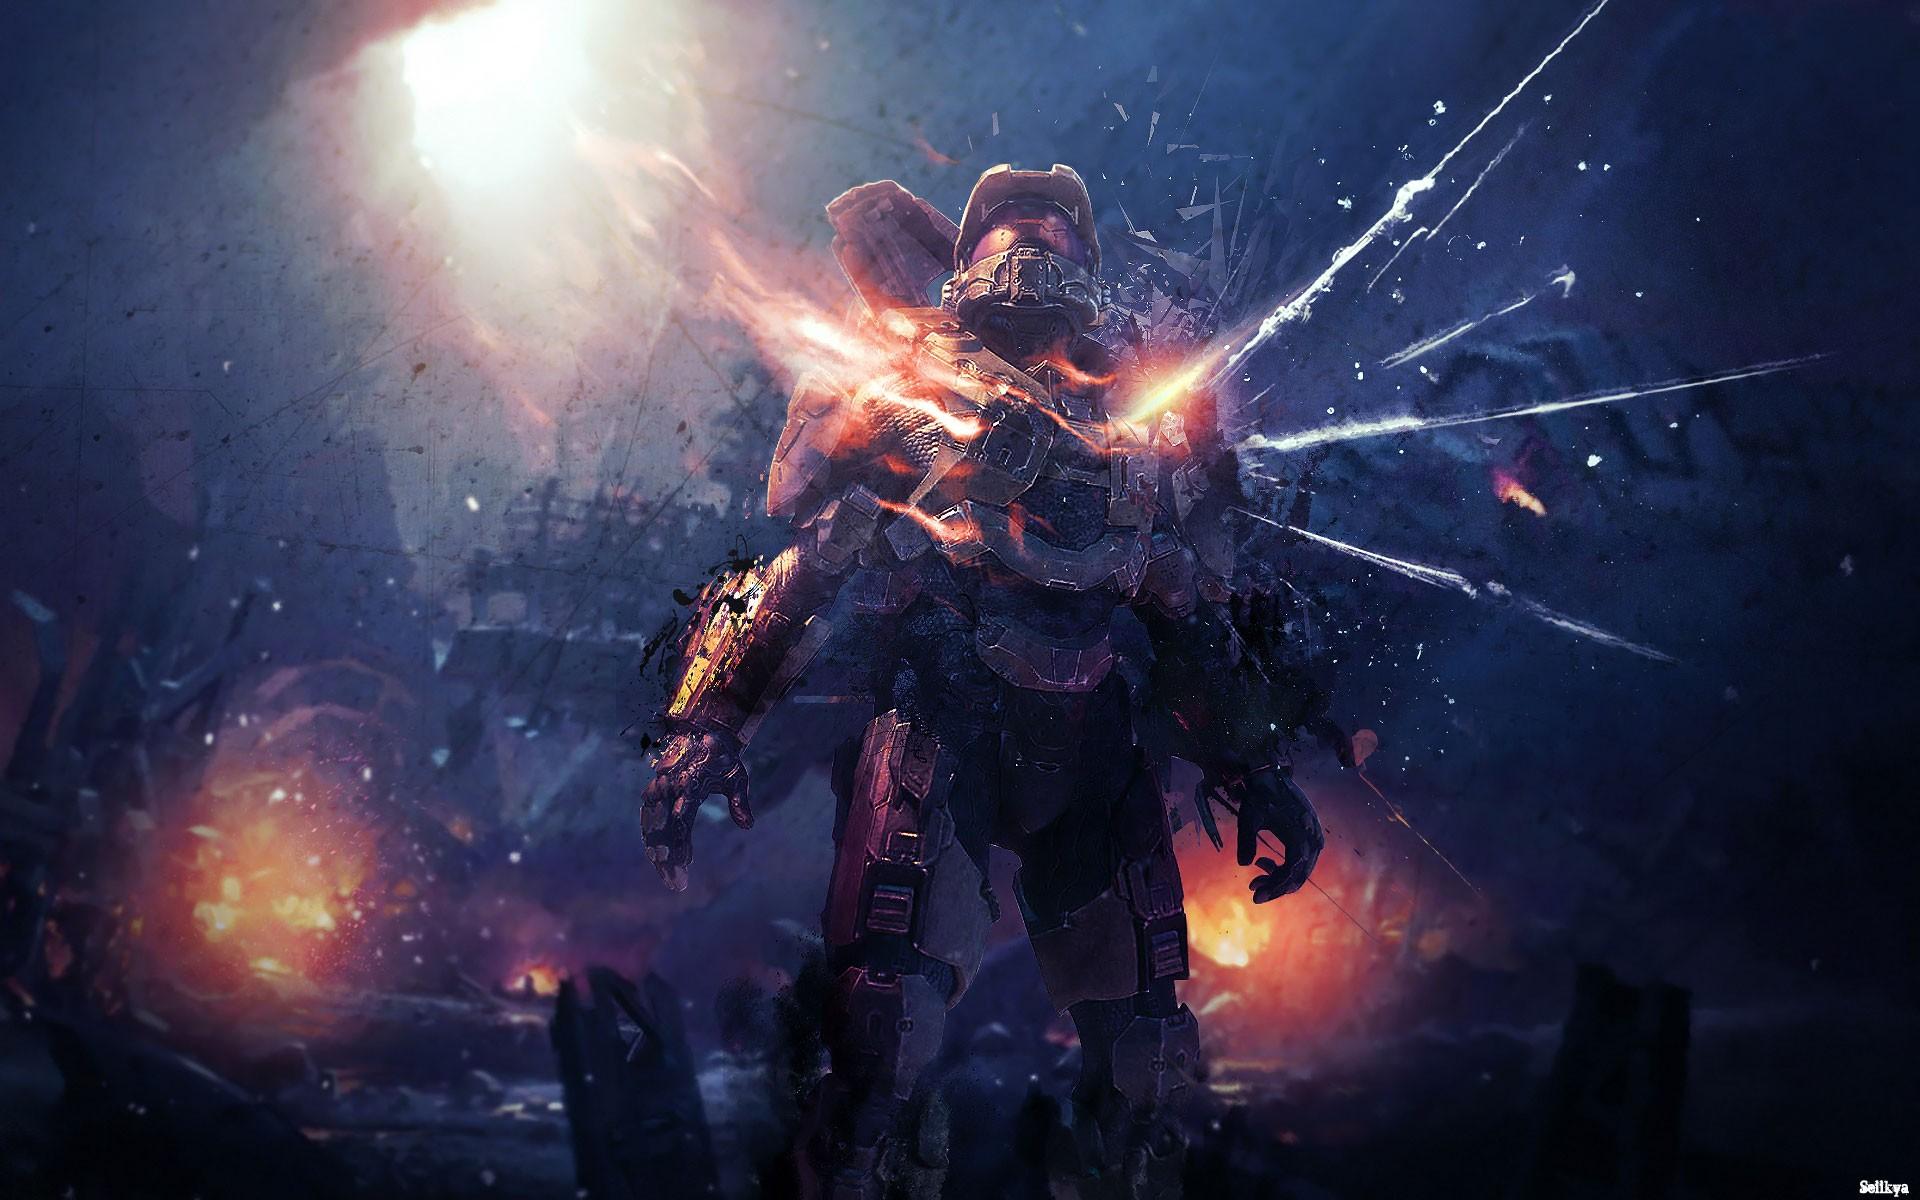 Wallpaper Video Games Artwork Master Chief Xbox One Halo